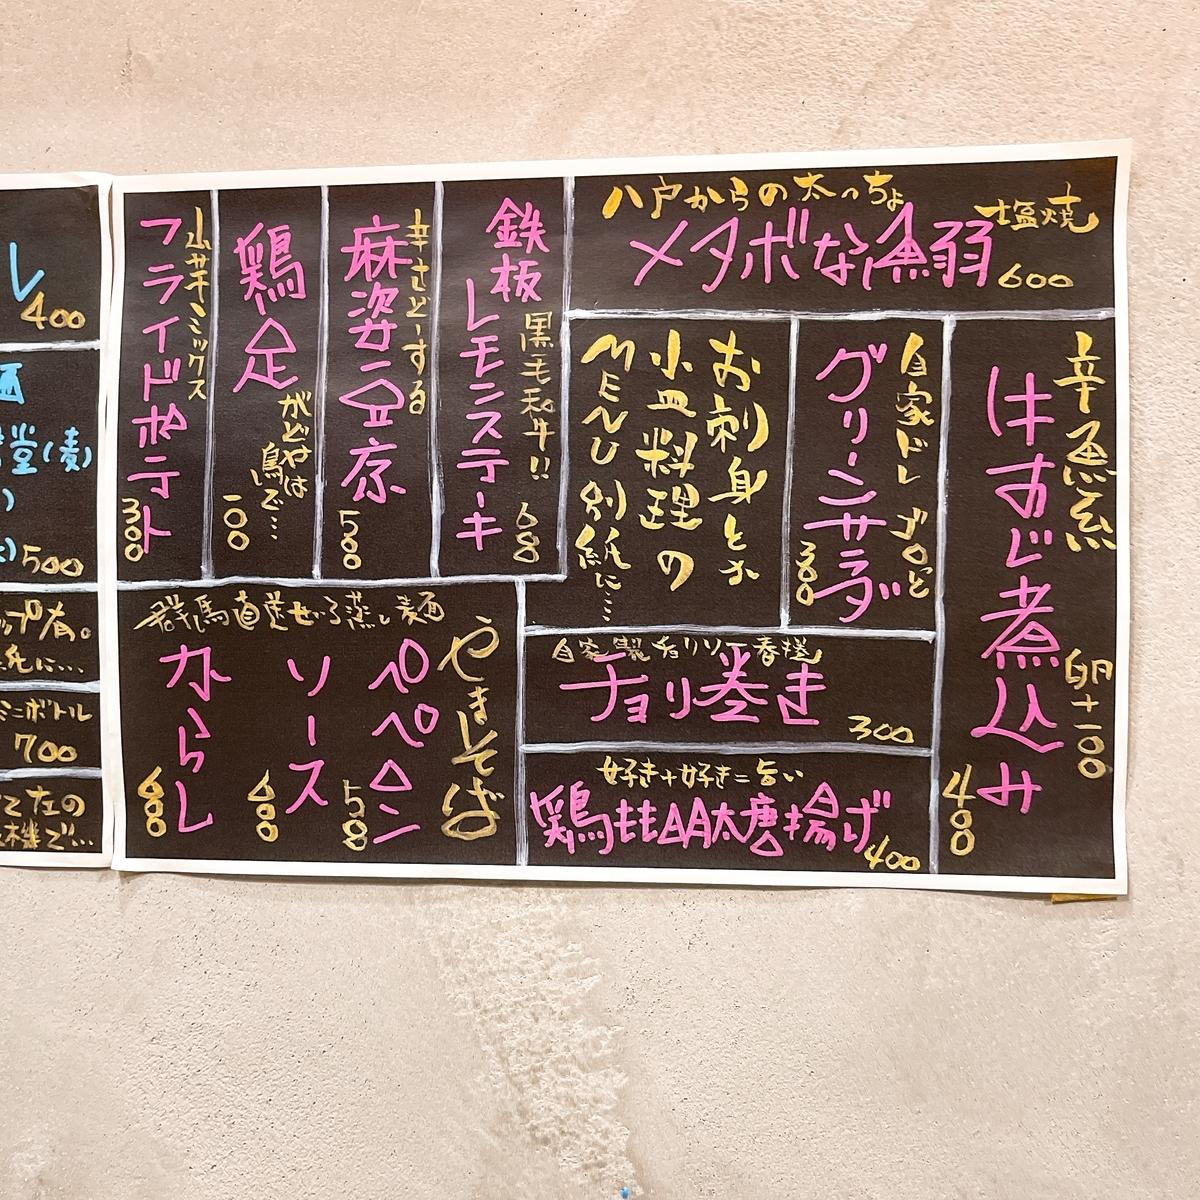 f:id:kanagurume:20211007095209j:plain